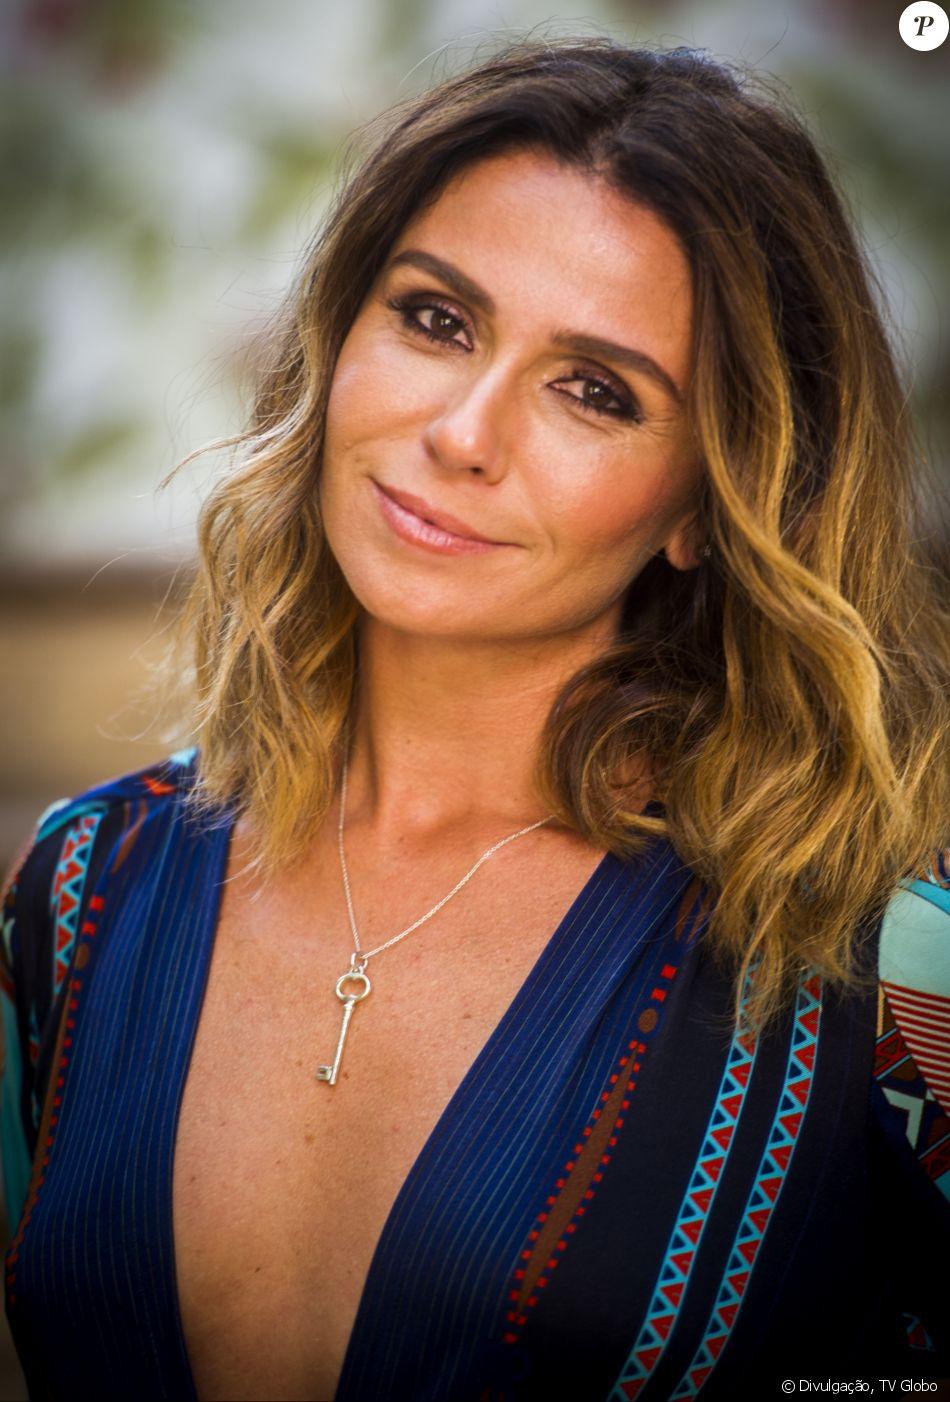 Pictures Giovanna Antonelli nude photos 2019